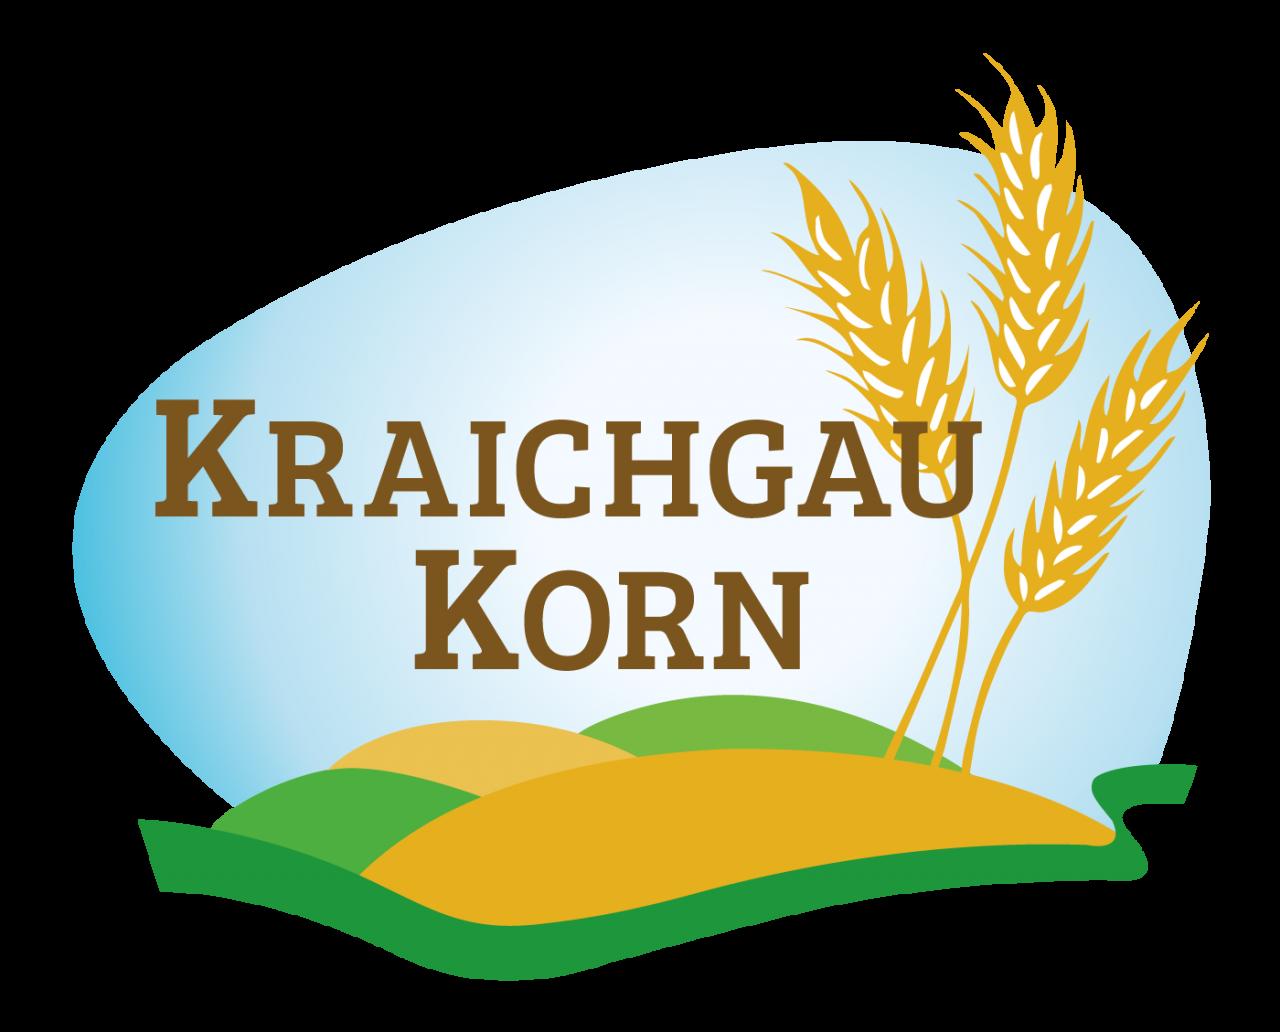 Logo_KraichgauKorn_evol02_inv_ohneR_RZ_rgbvOYKL3UQMFKeZ